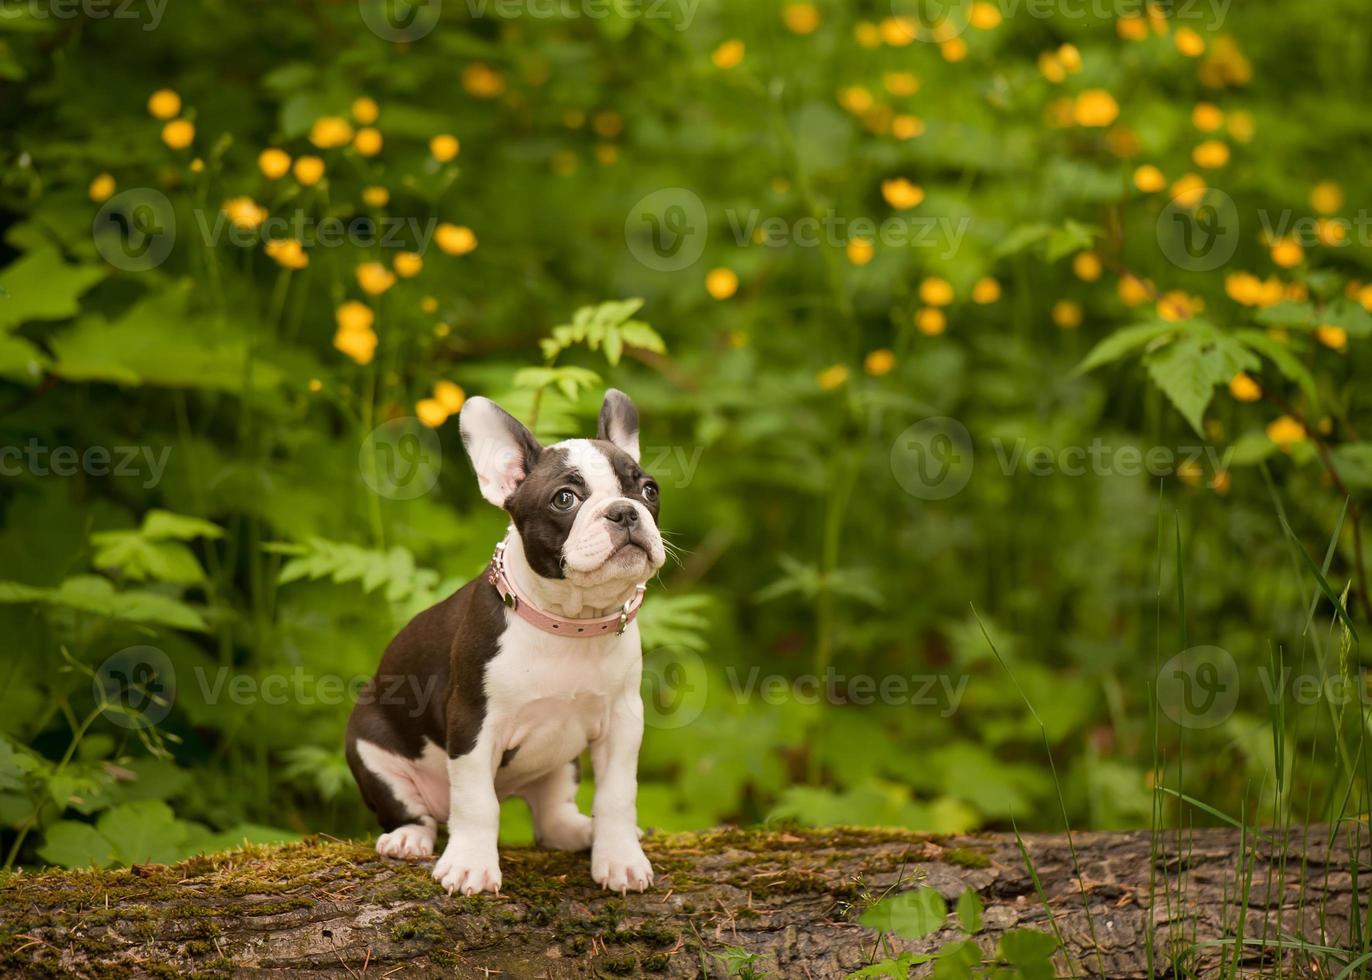 Boston Terrier French Bulldog Puppy photo